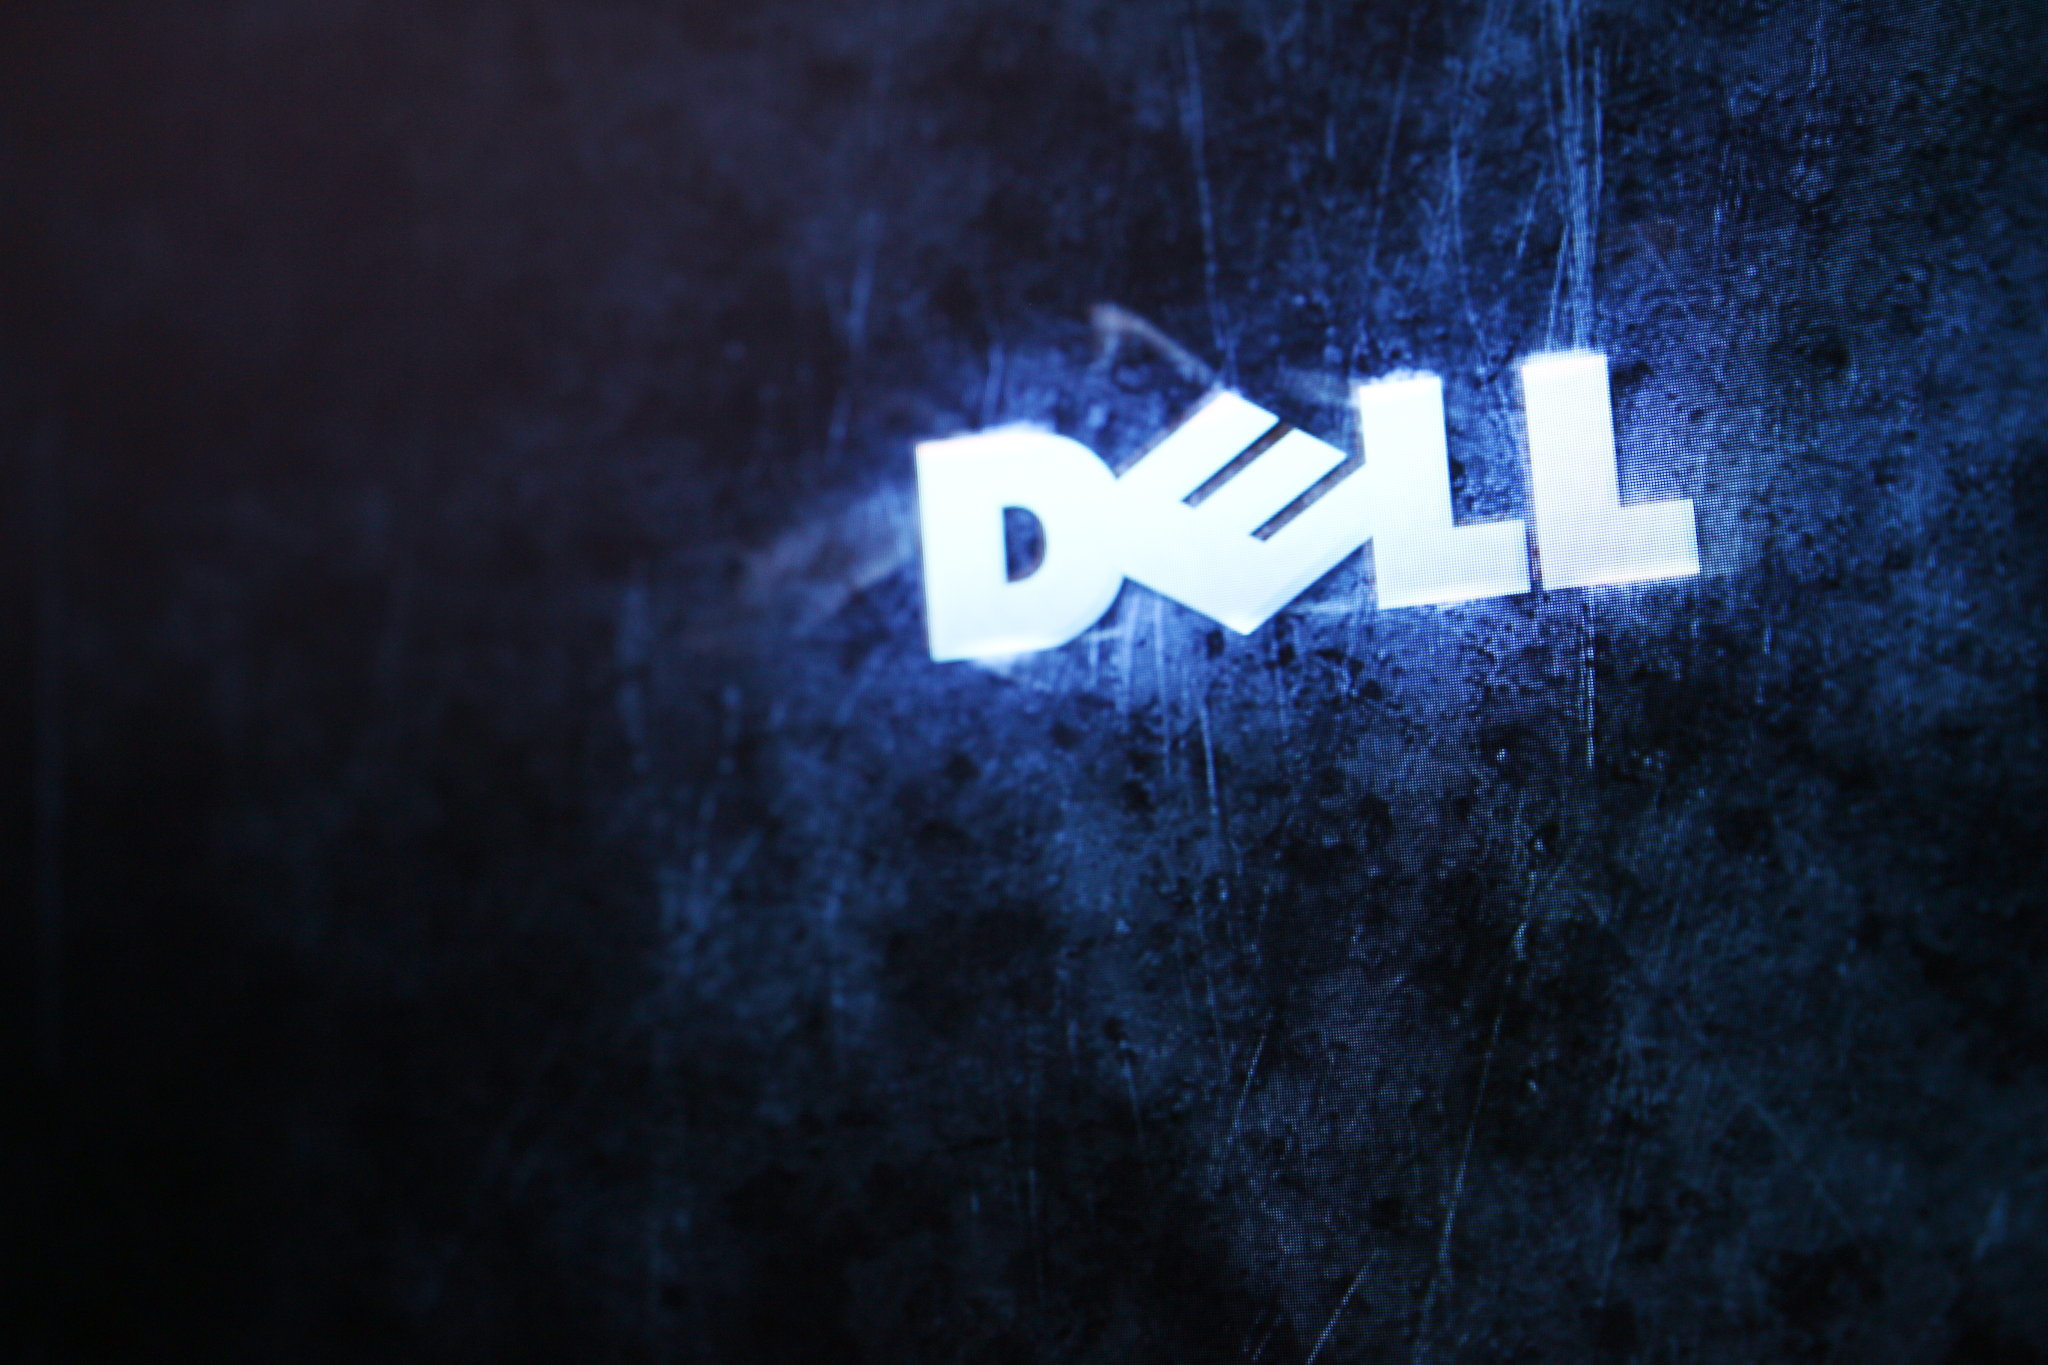 3d Moving Wallpaper Download For Windows 7 Dell Wallpapers Hd Pixelstalk Net